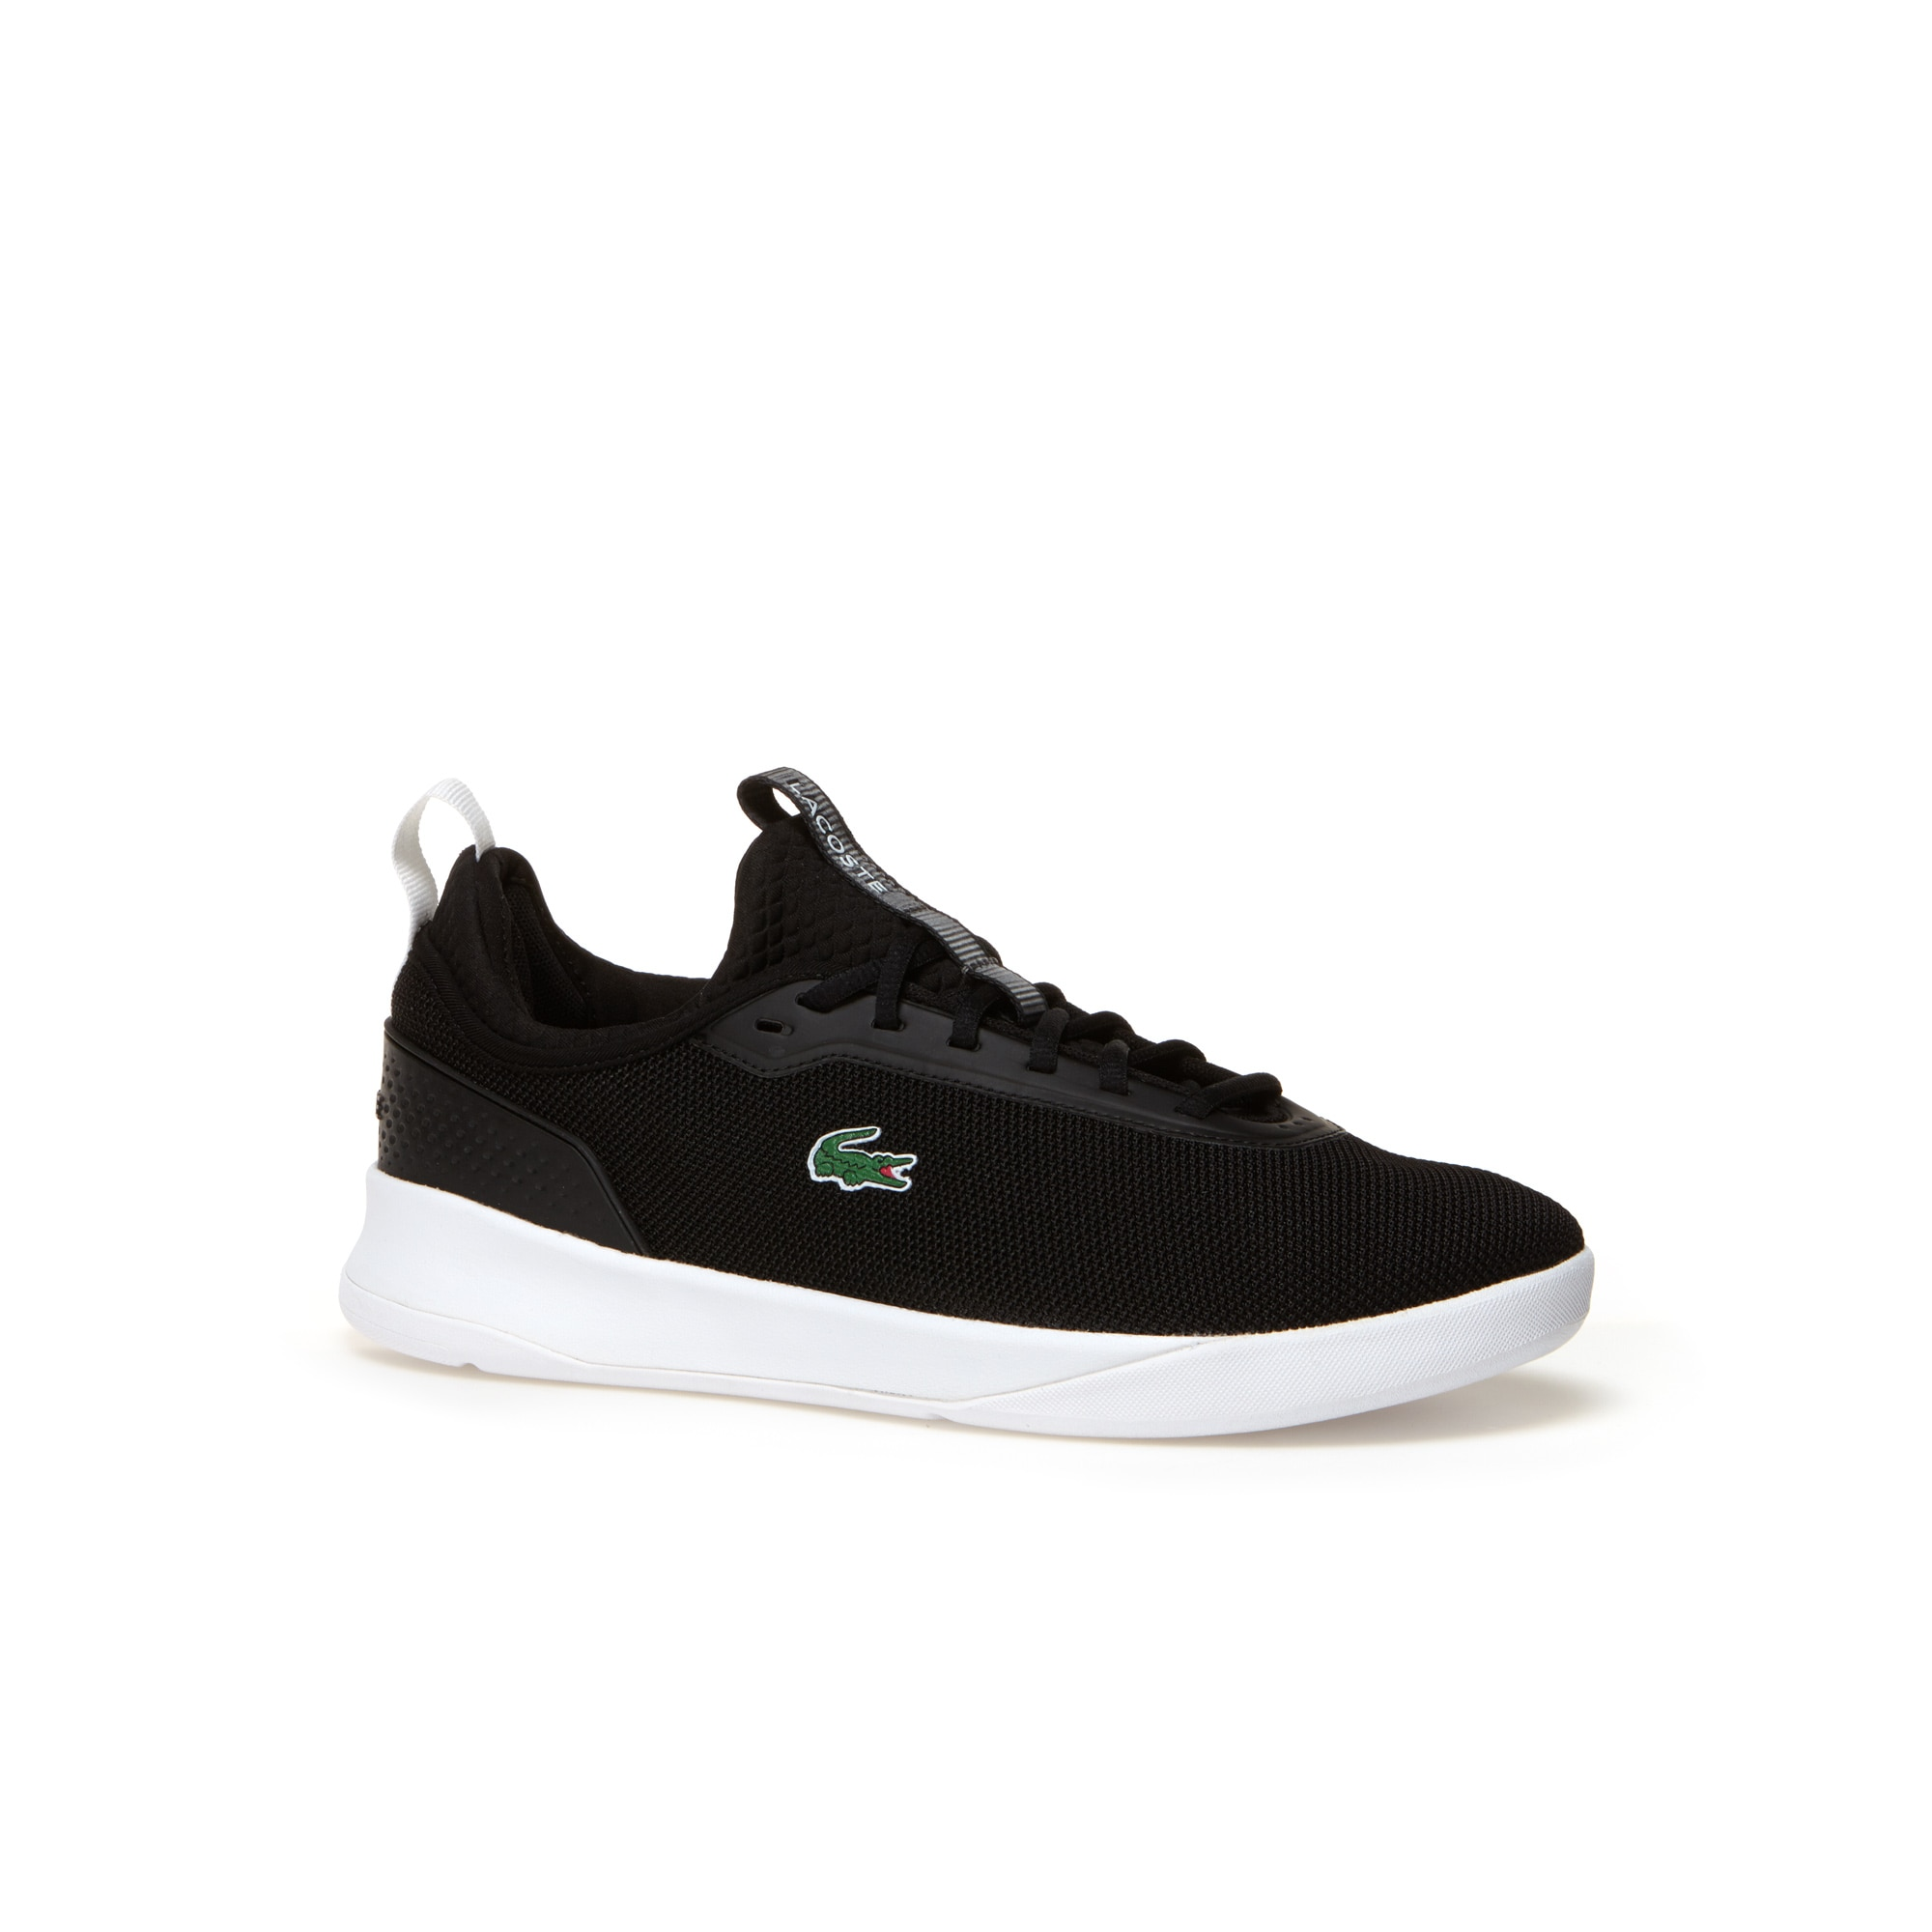 Herren-Sneakers LT SPIRIT 2.0 aus Stoff